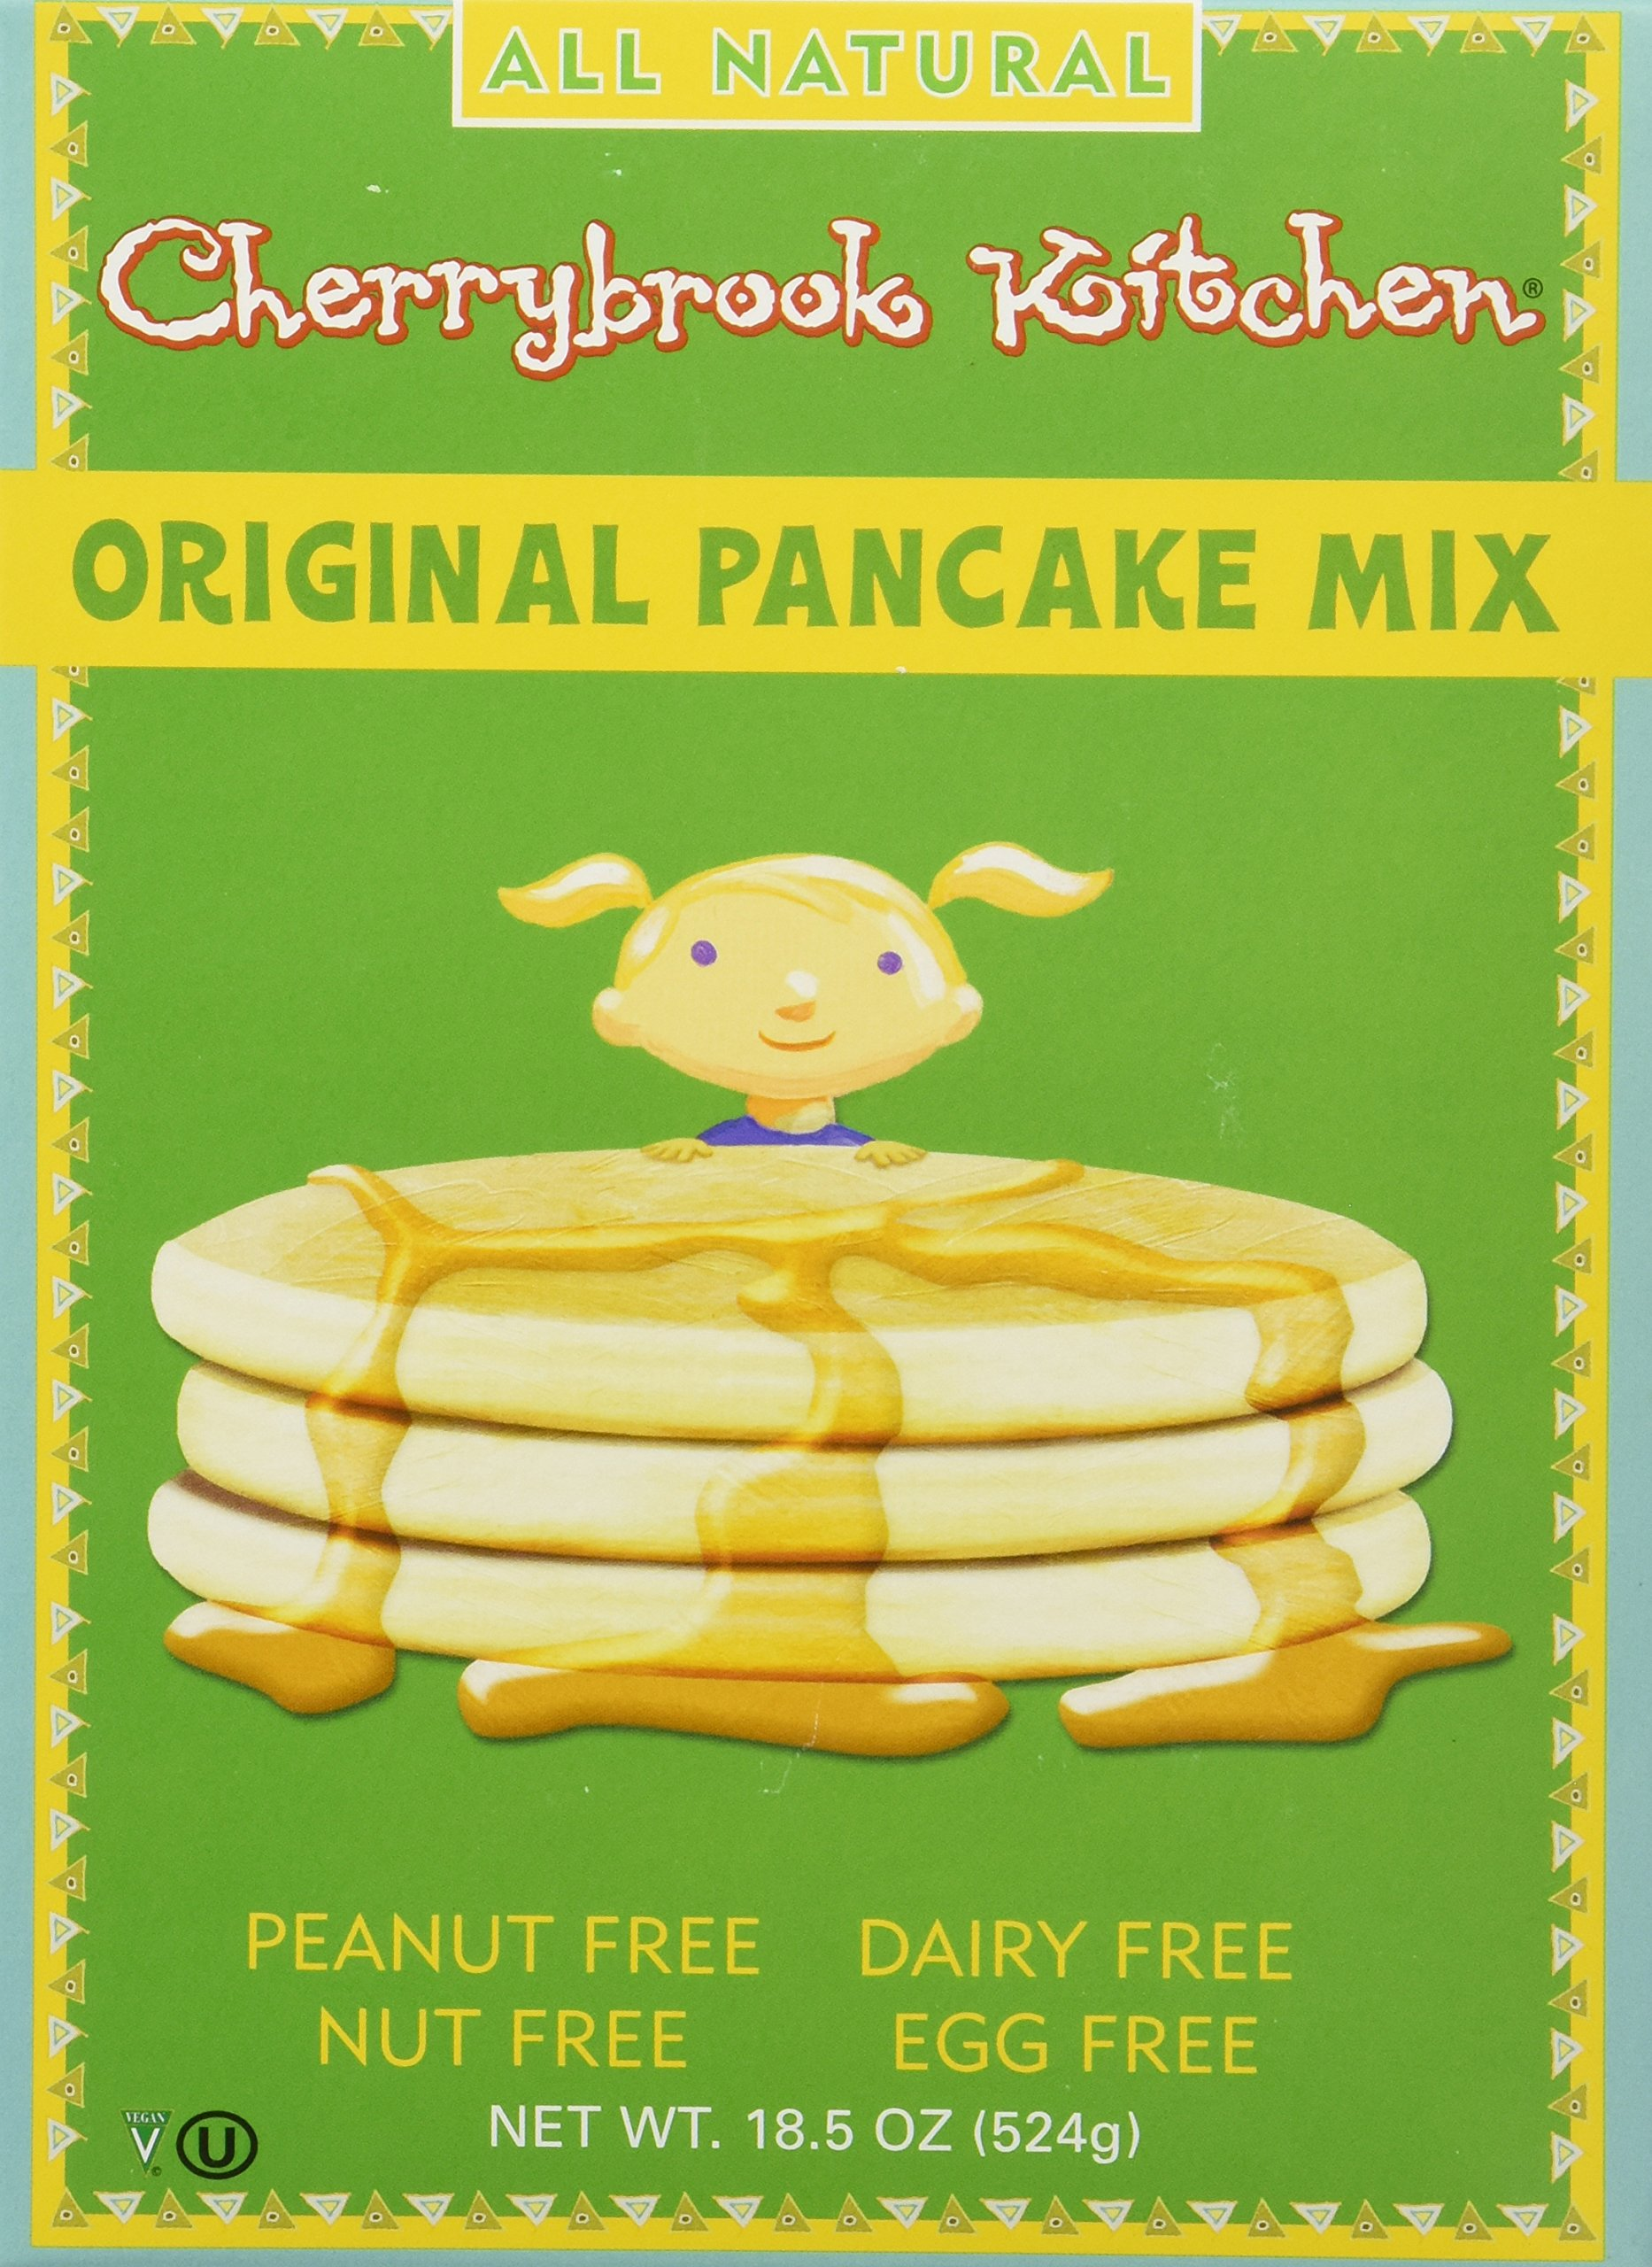 Cherrybrook Kitchen Original Pancake Mix, 18.5-Ounce Boxes (Pack of 6)